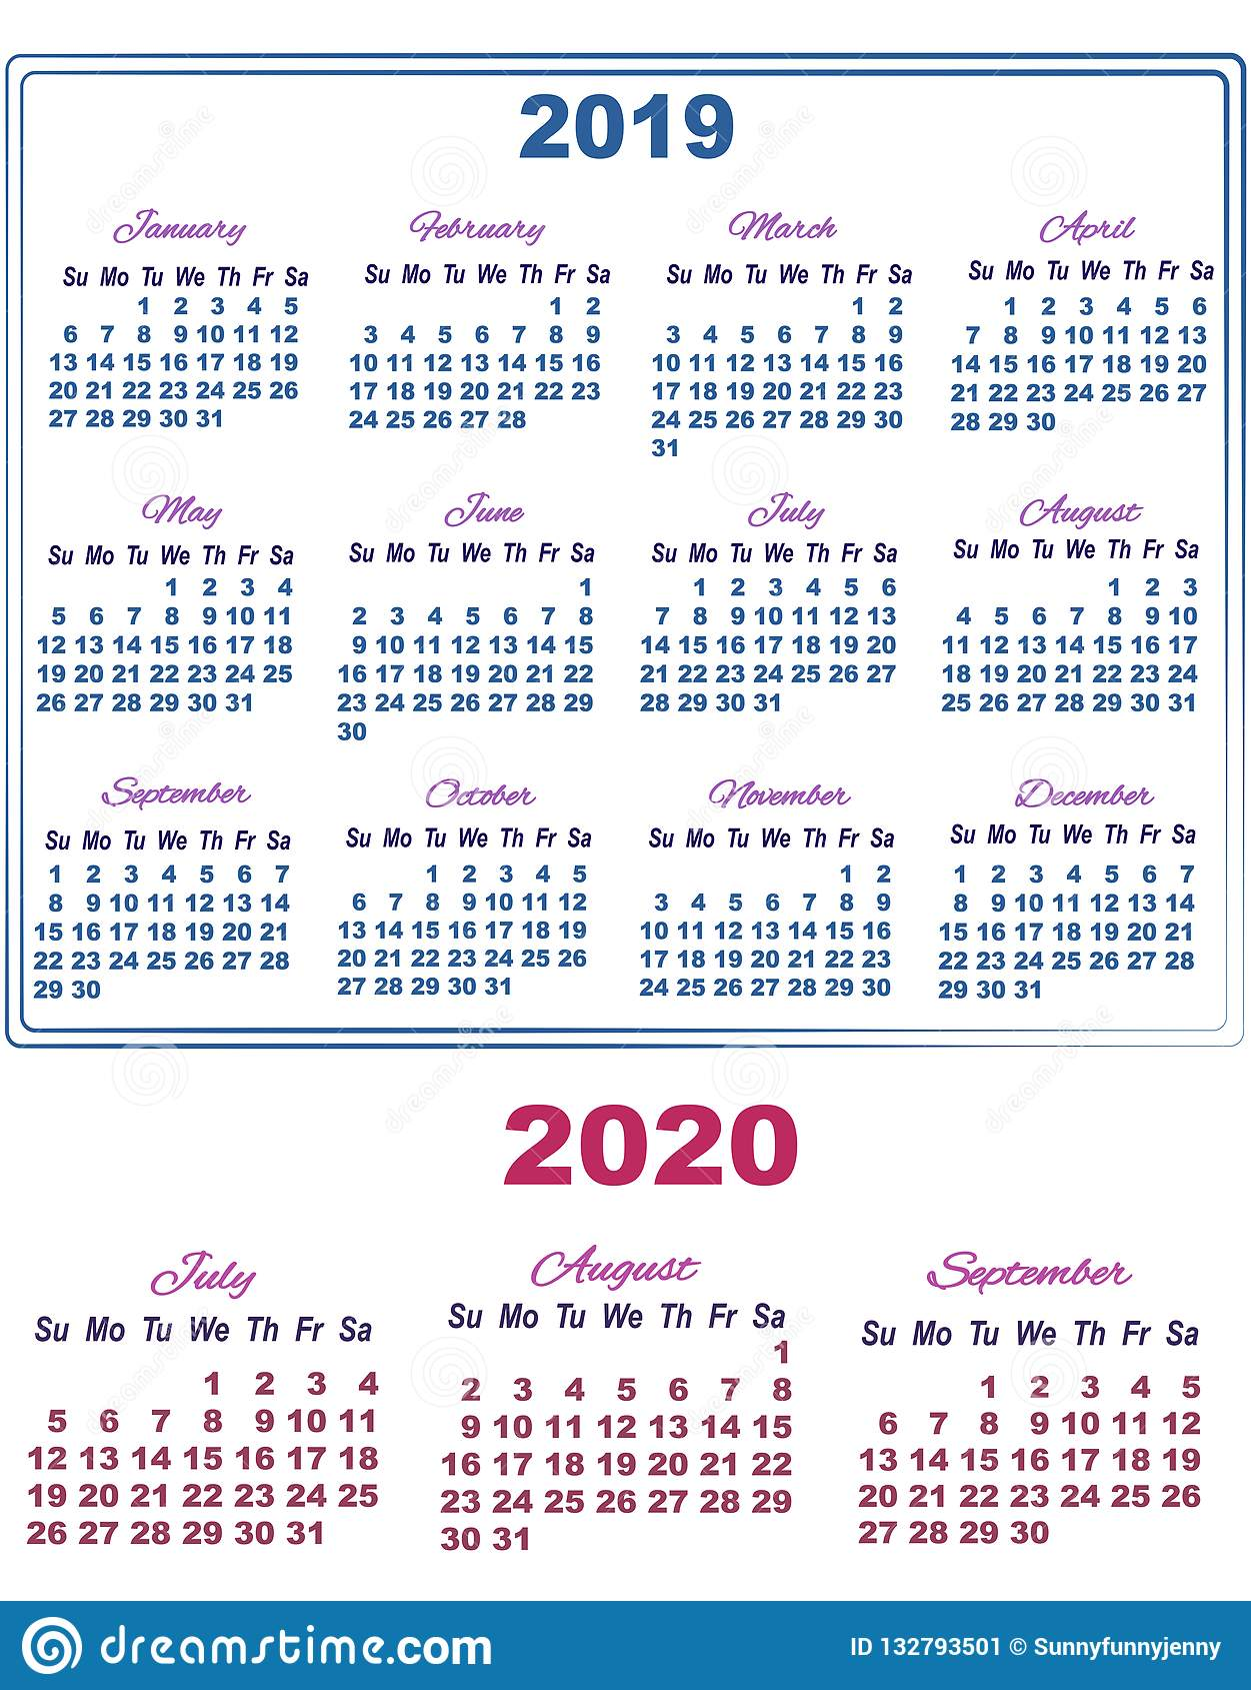 Calendario Agosto 2020.Calendario Luglio Agosto 2020 Calendario 2020